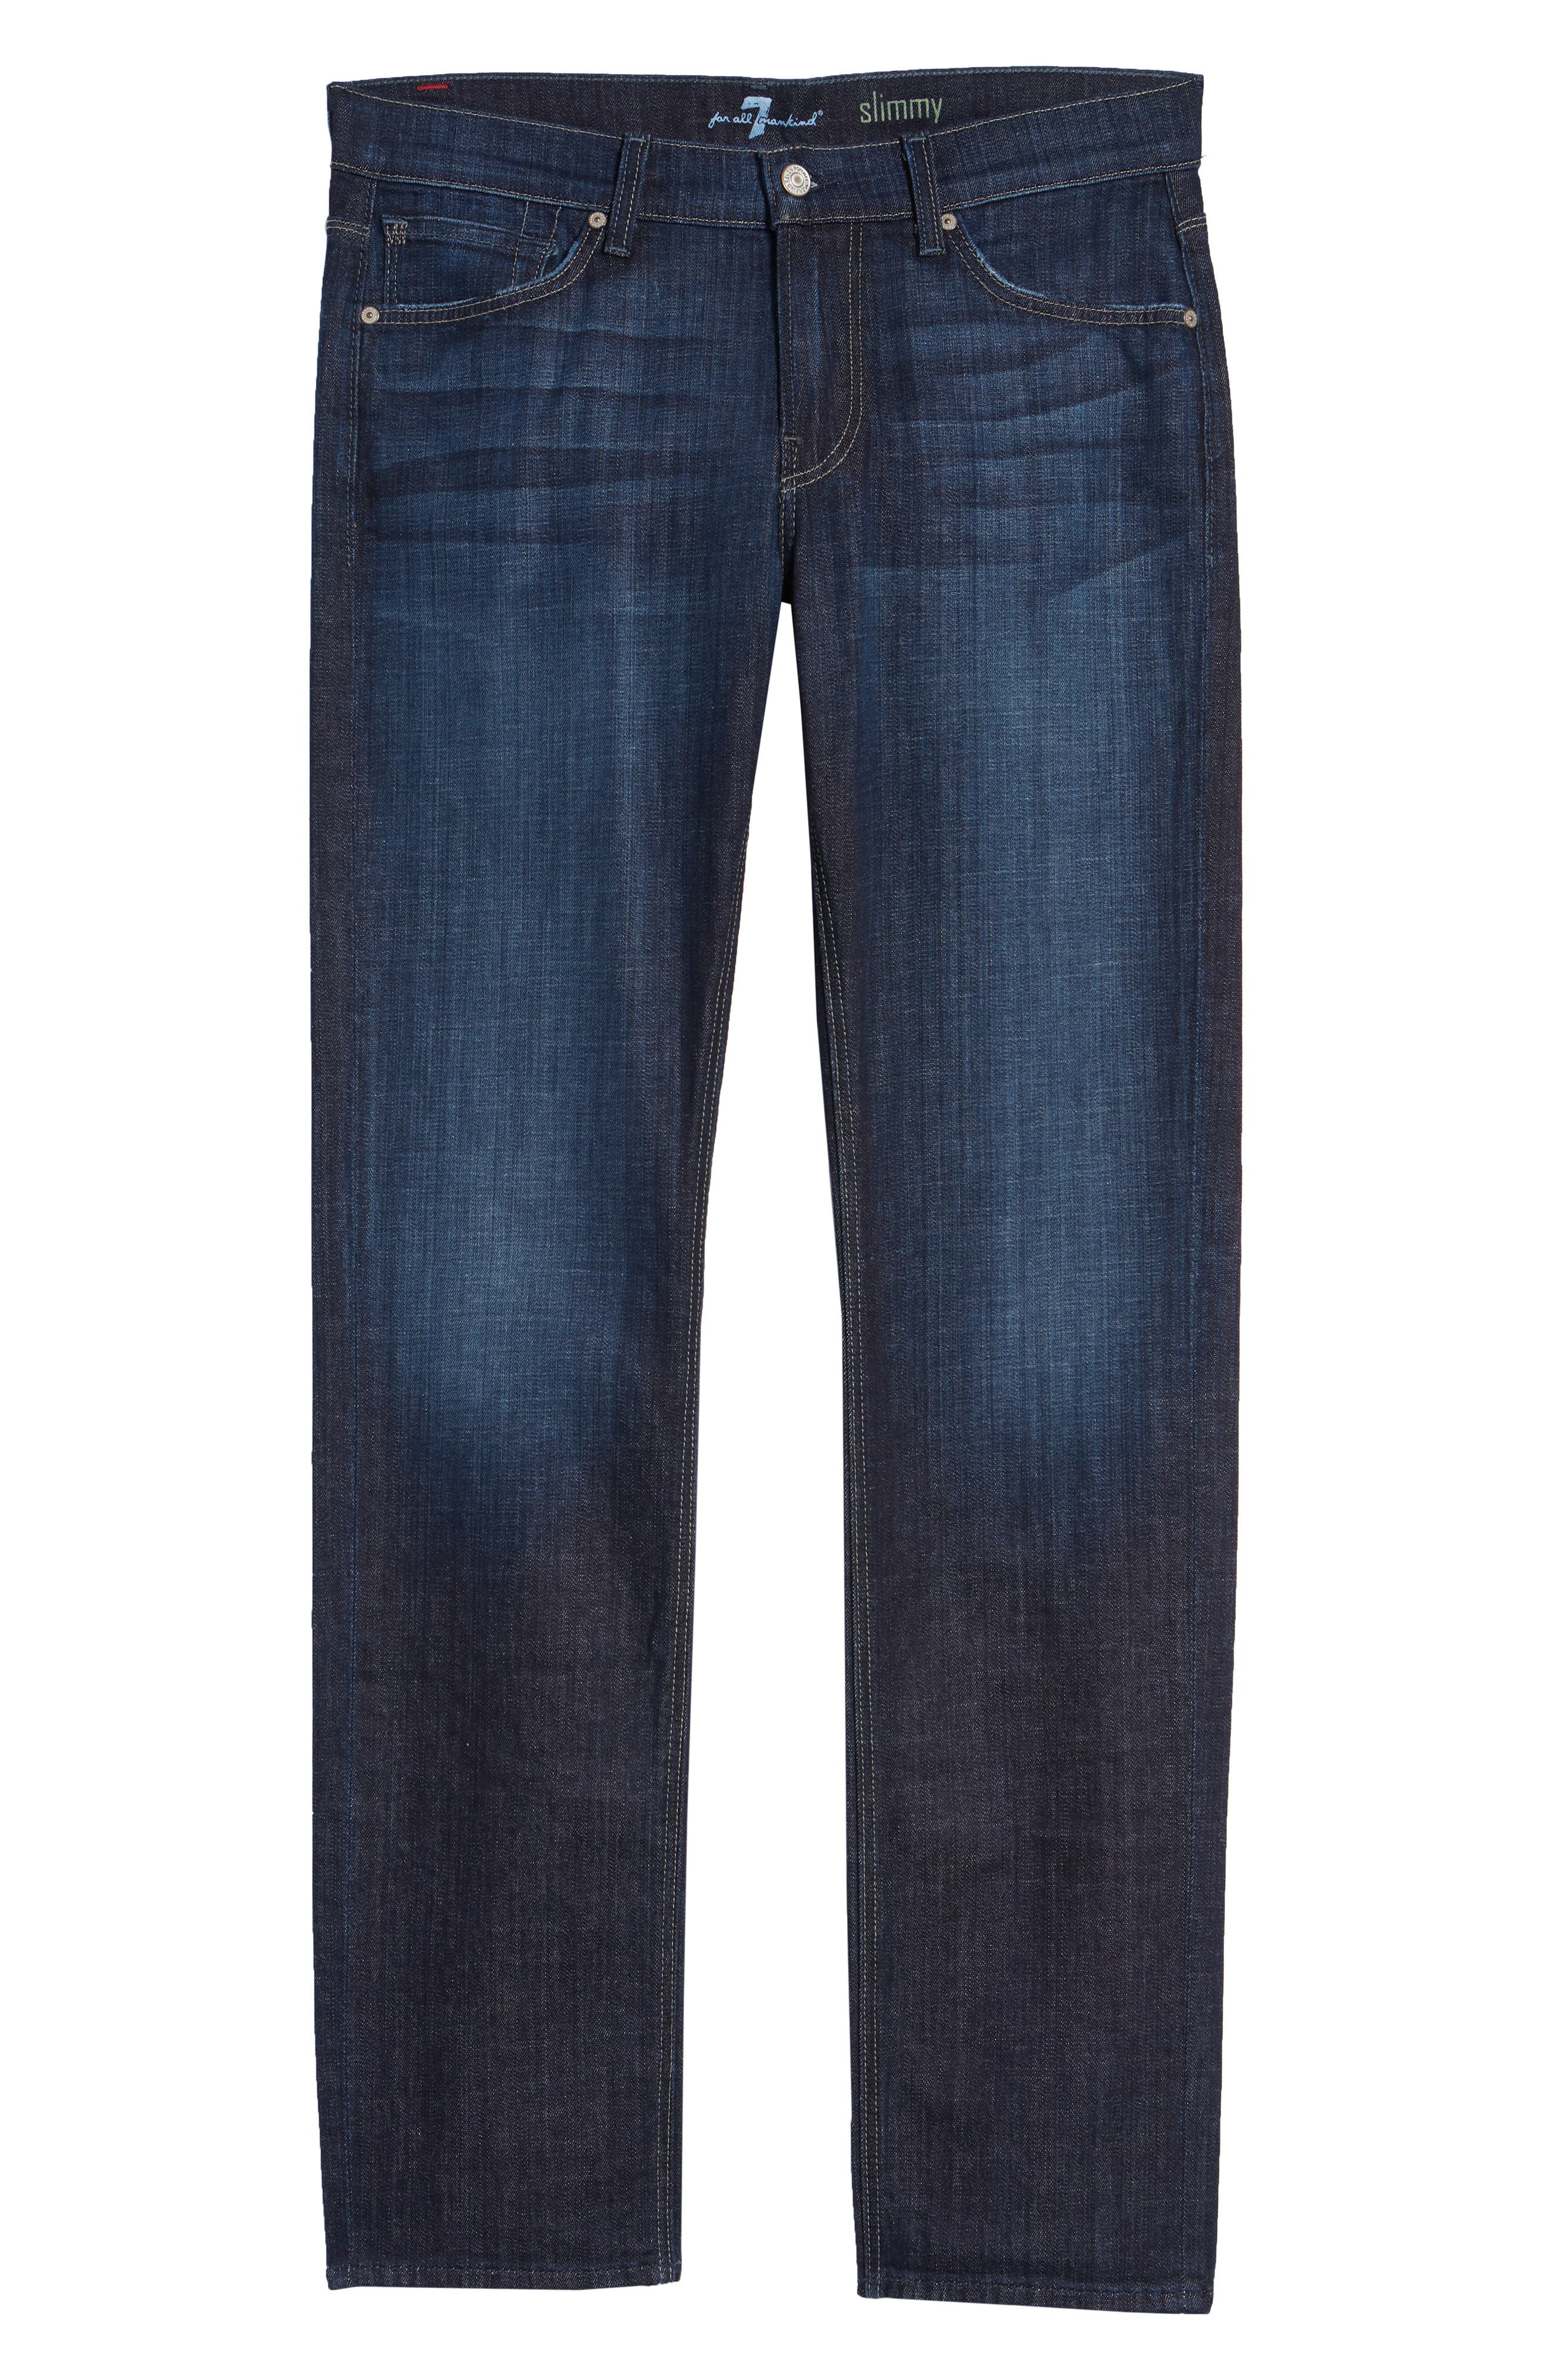 'Slimmy' Slim Fit Jeans,                             Alternate thumbnail 2, color,                             400